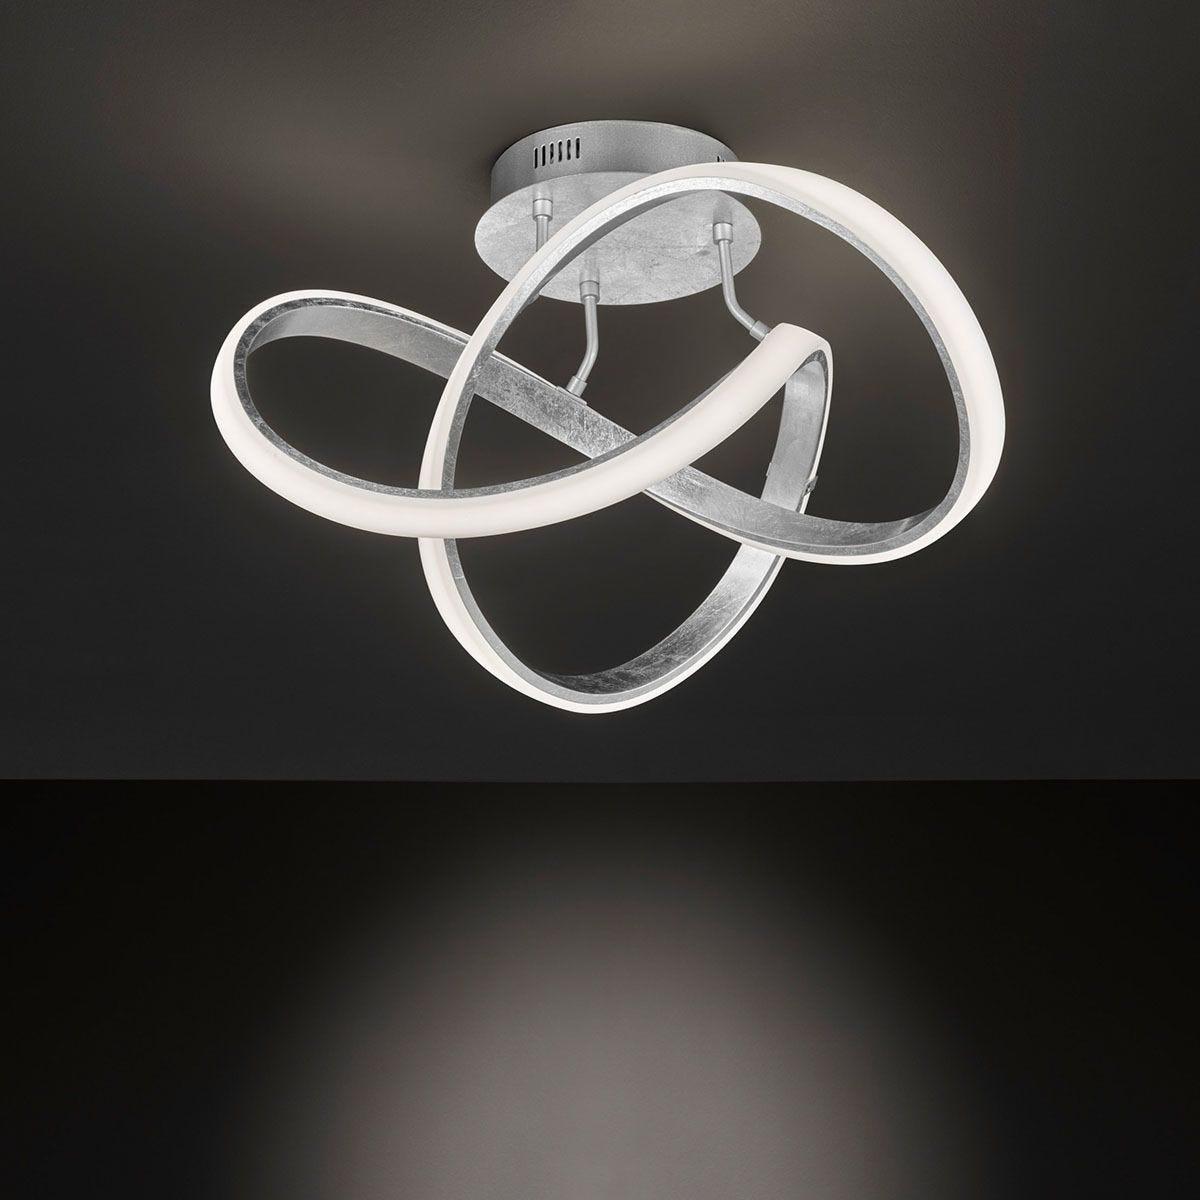 Wofi Indigo LED Flush Fitting Ceiling Lamp - Silver